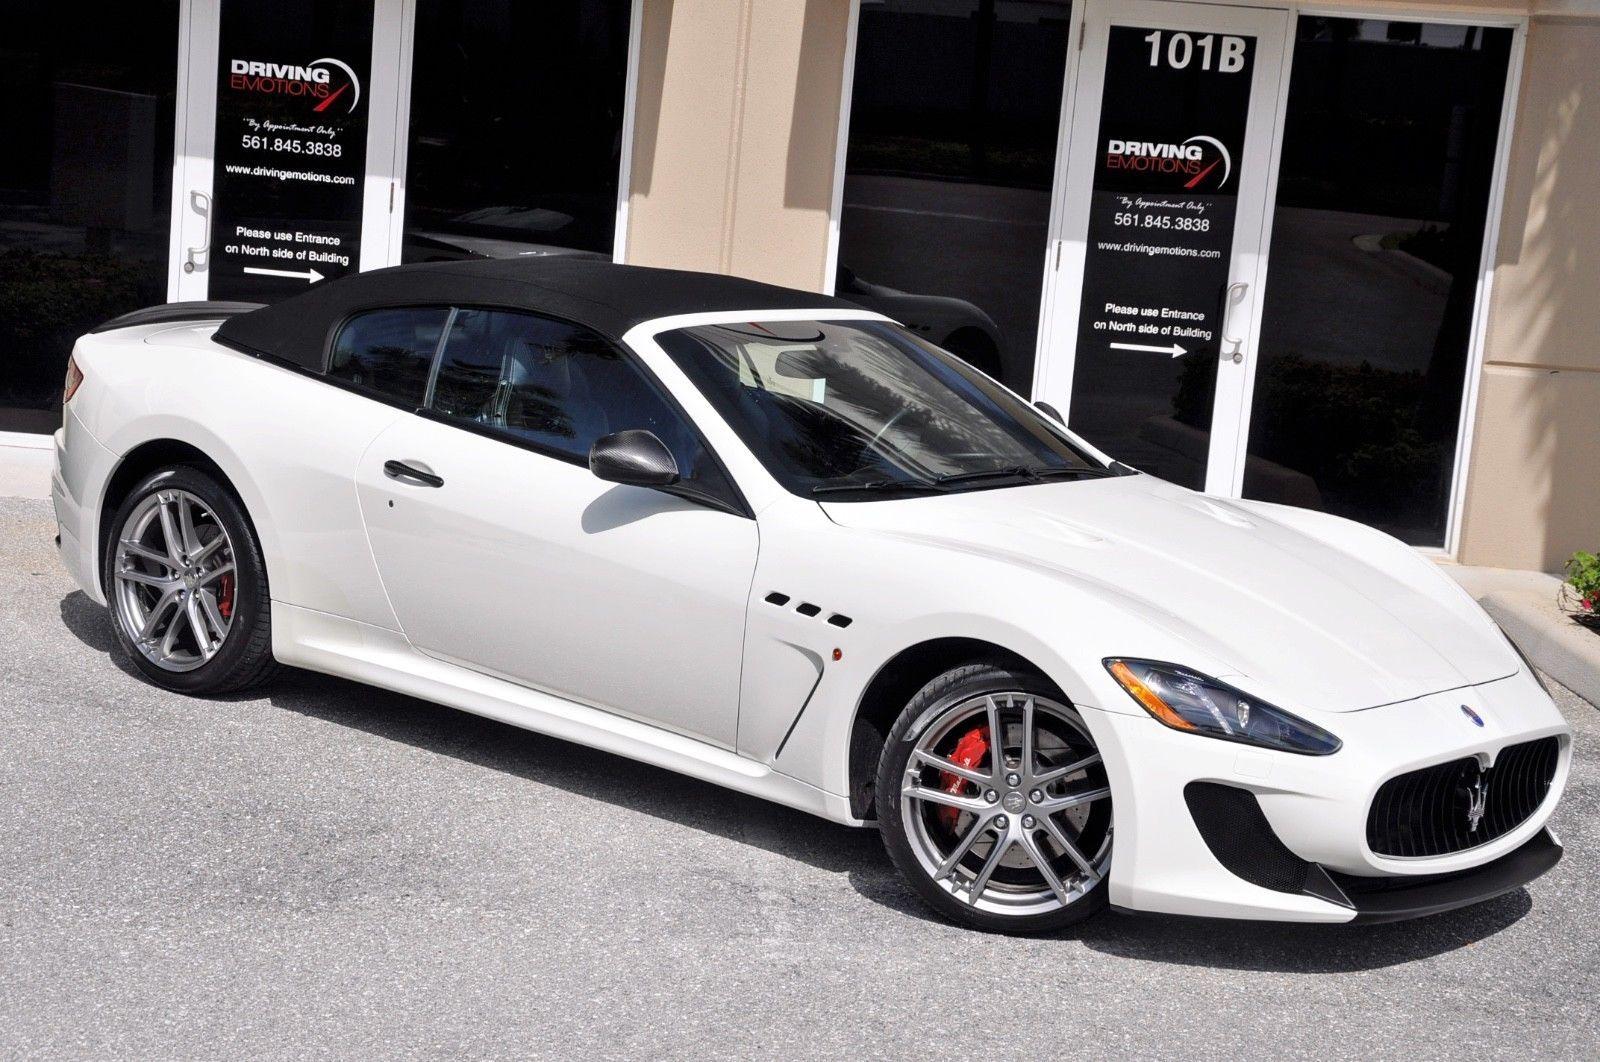 2014 Maserati Gran Turismo Mc Convertible 170k Msrp 2014 Maserati Granturismo Mc Convertible White Maserati Granturismo 2014 Maserati Granturismo Maserati